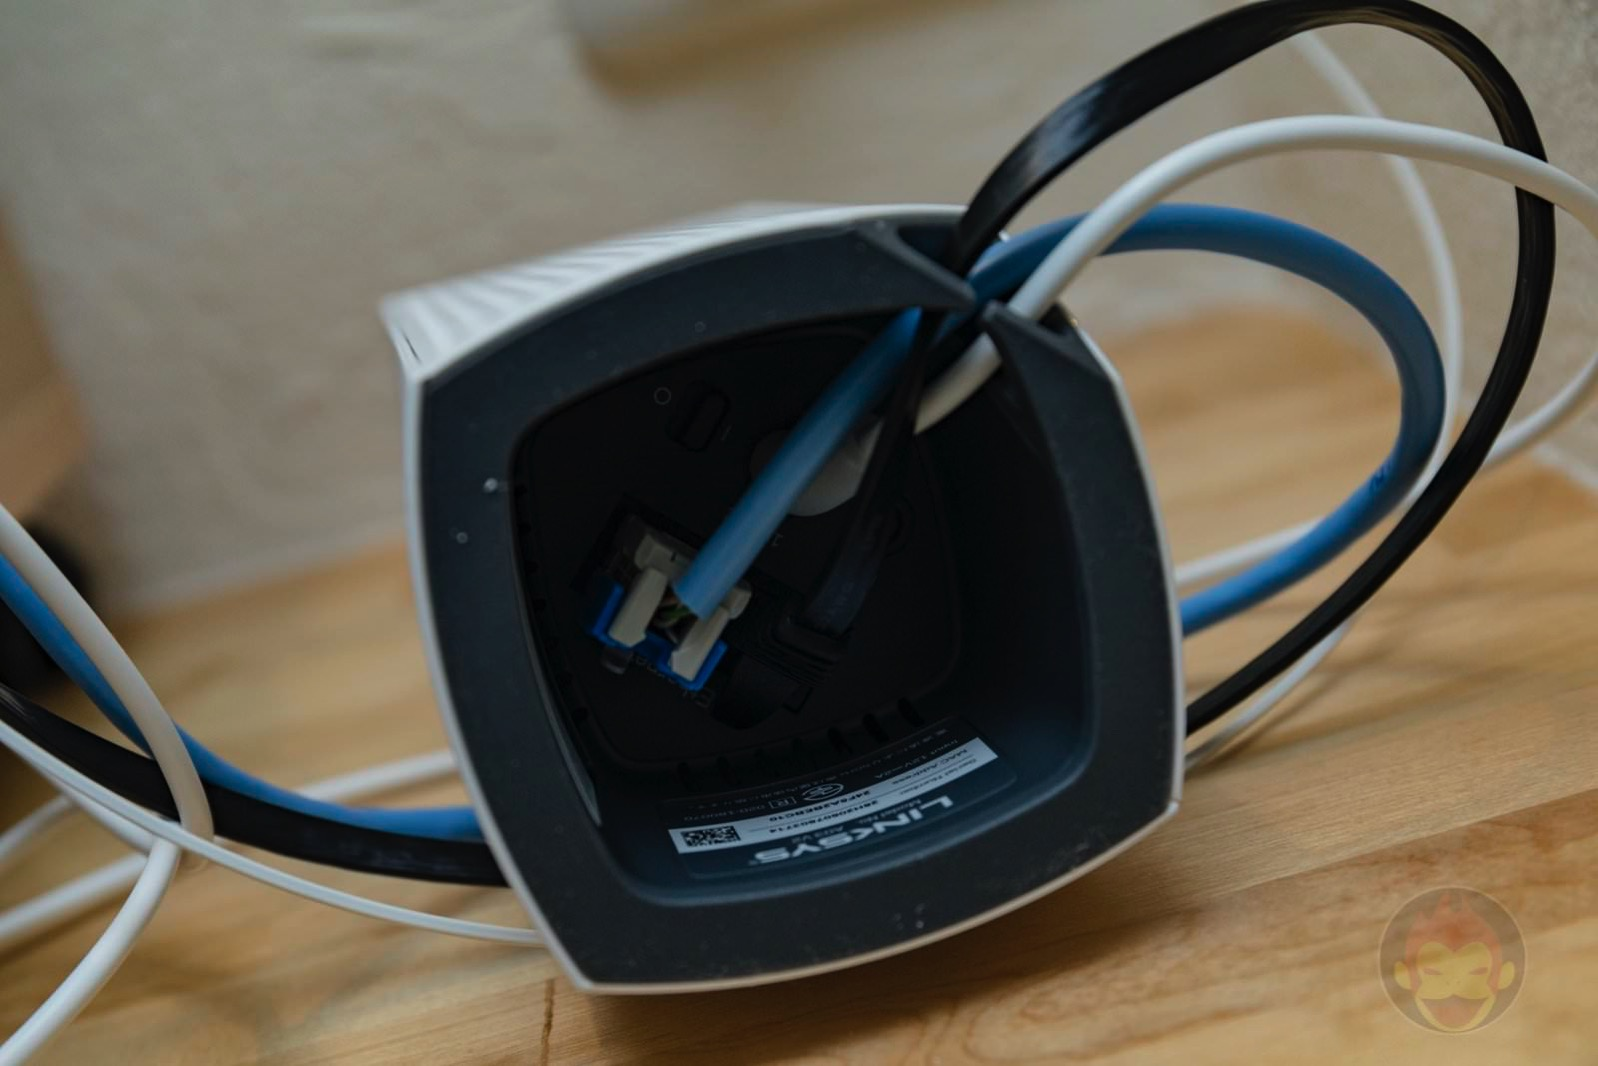 Linksys-Velop-WiFi-Router-08.jpg